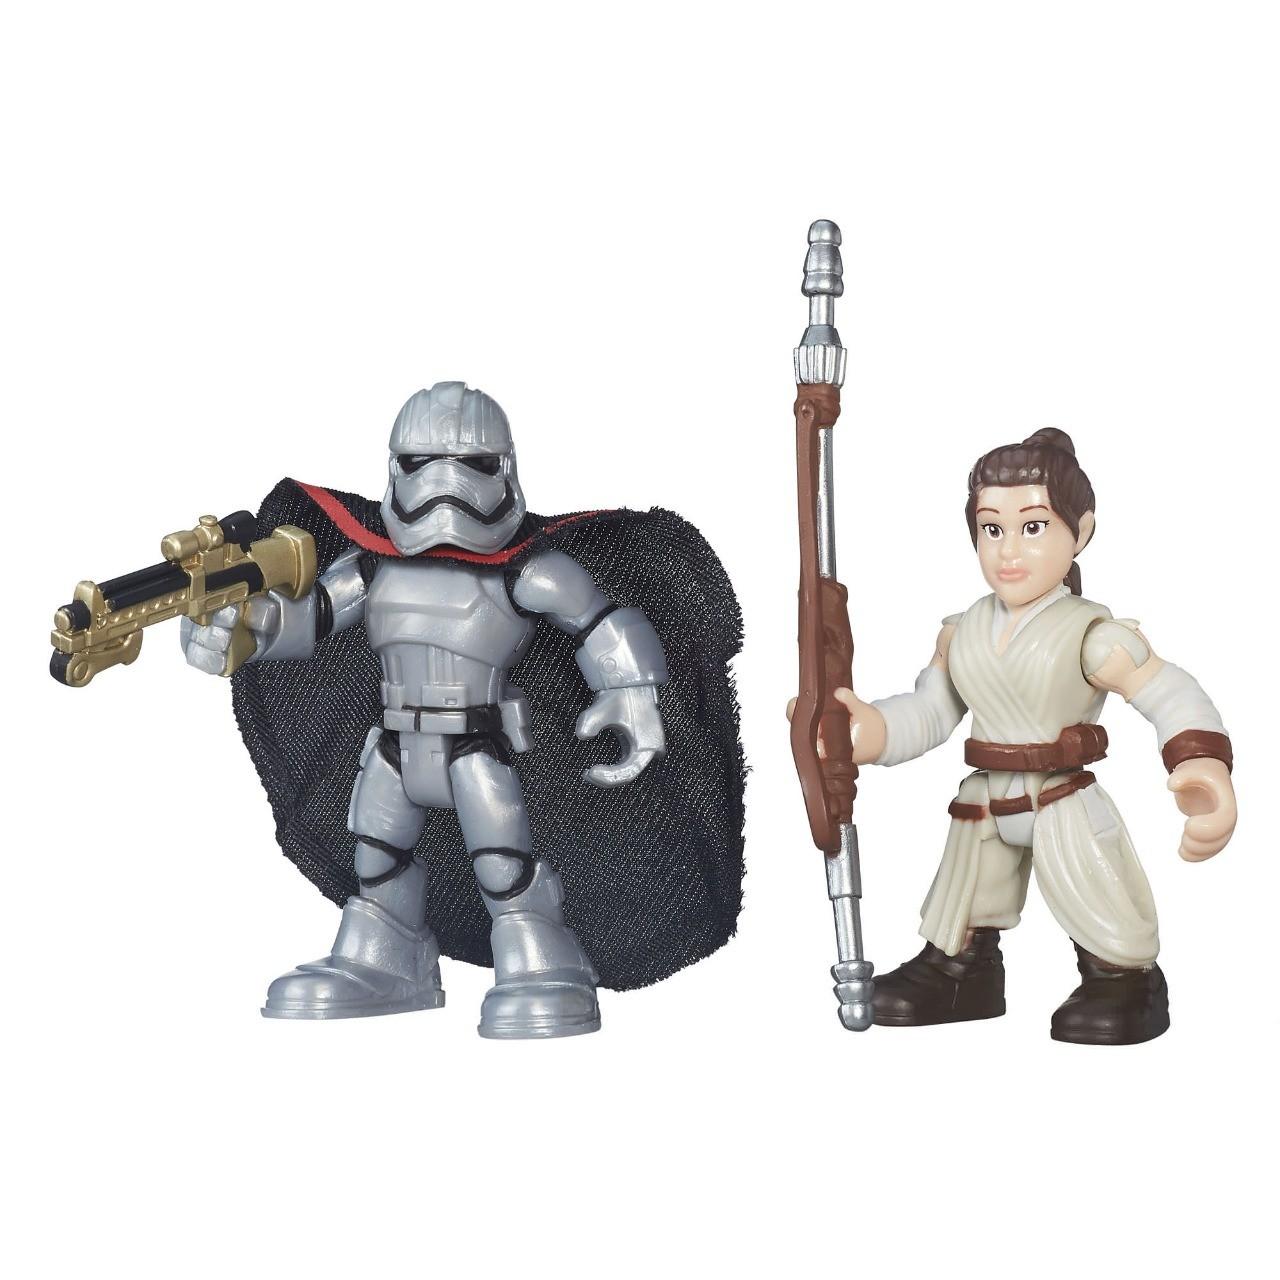 MIni Figuras Articuladas Galactic Heroes Star Wars Rei Jakku e Captain Phasma  Hasbro